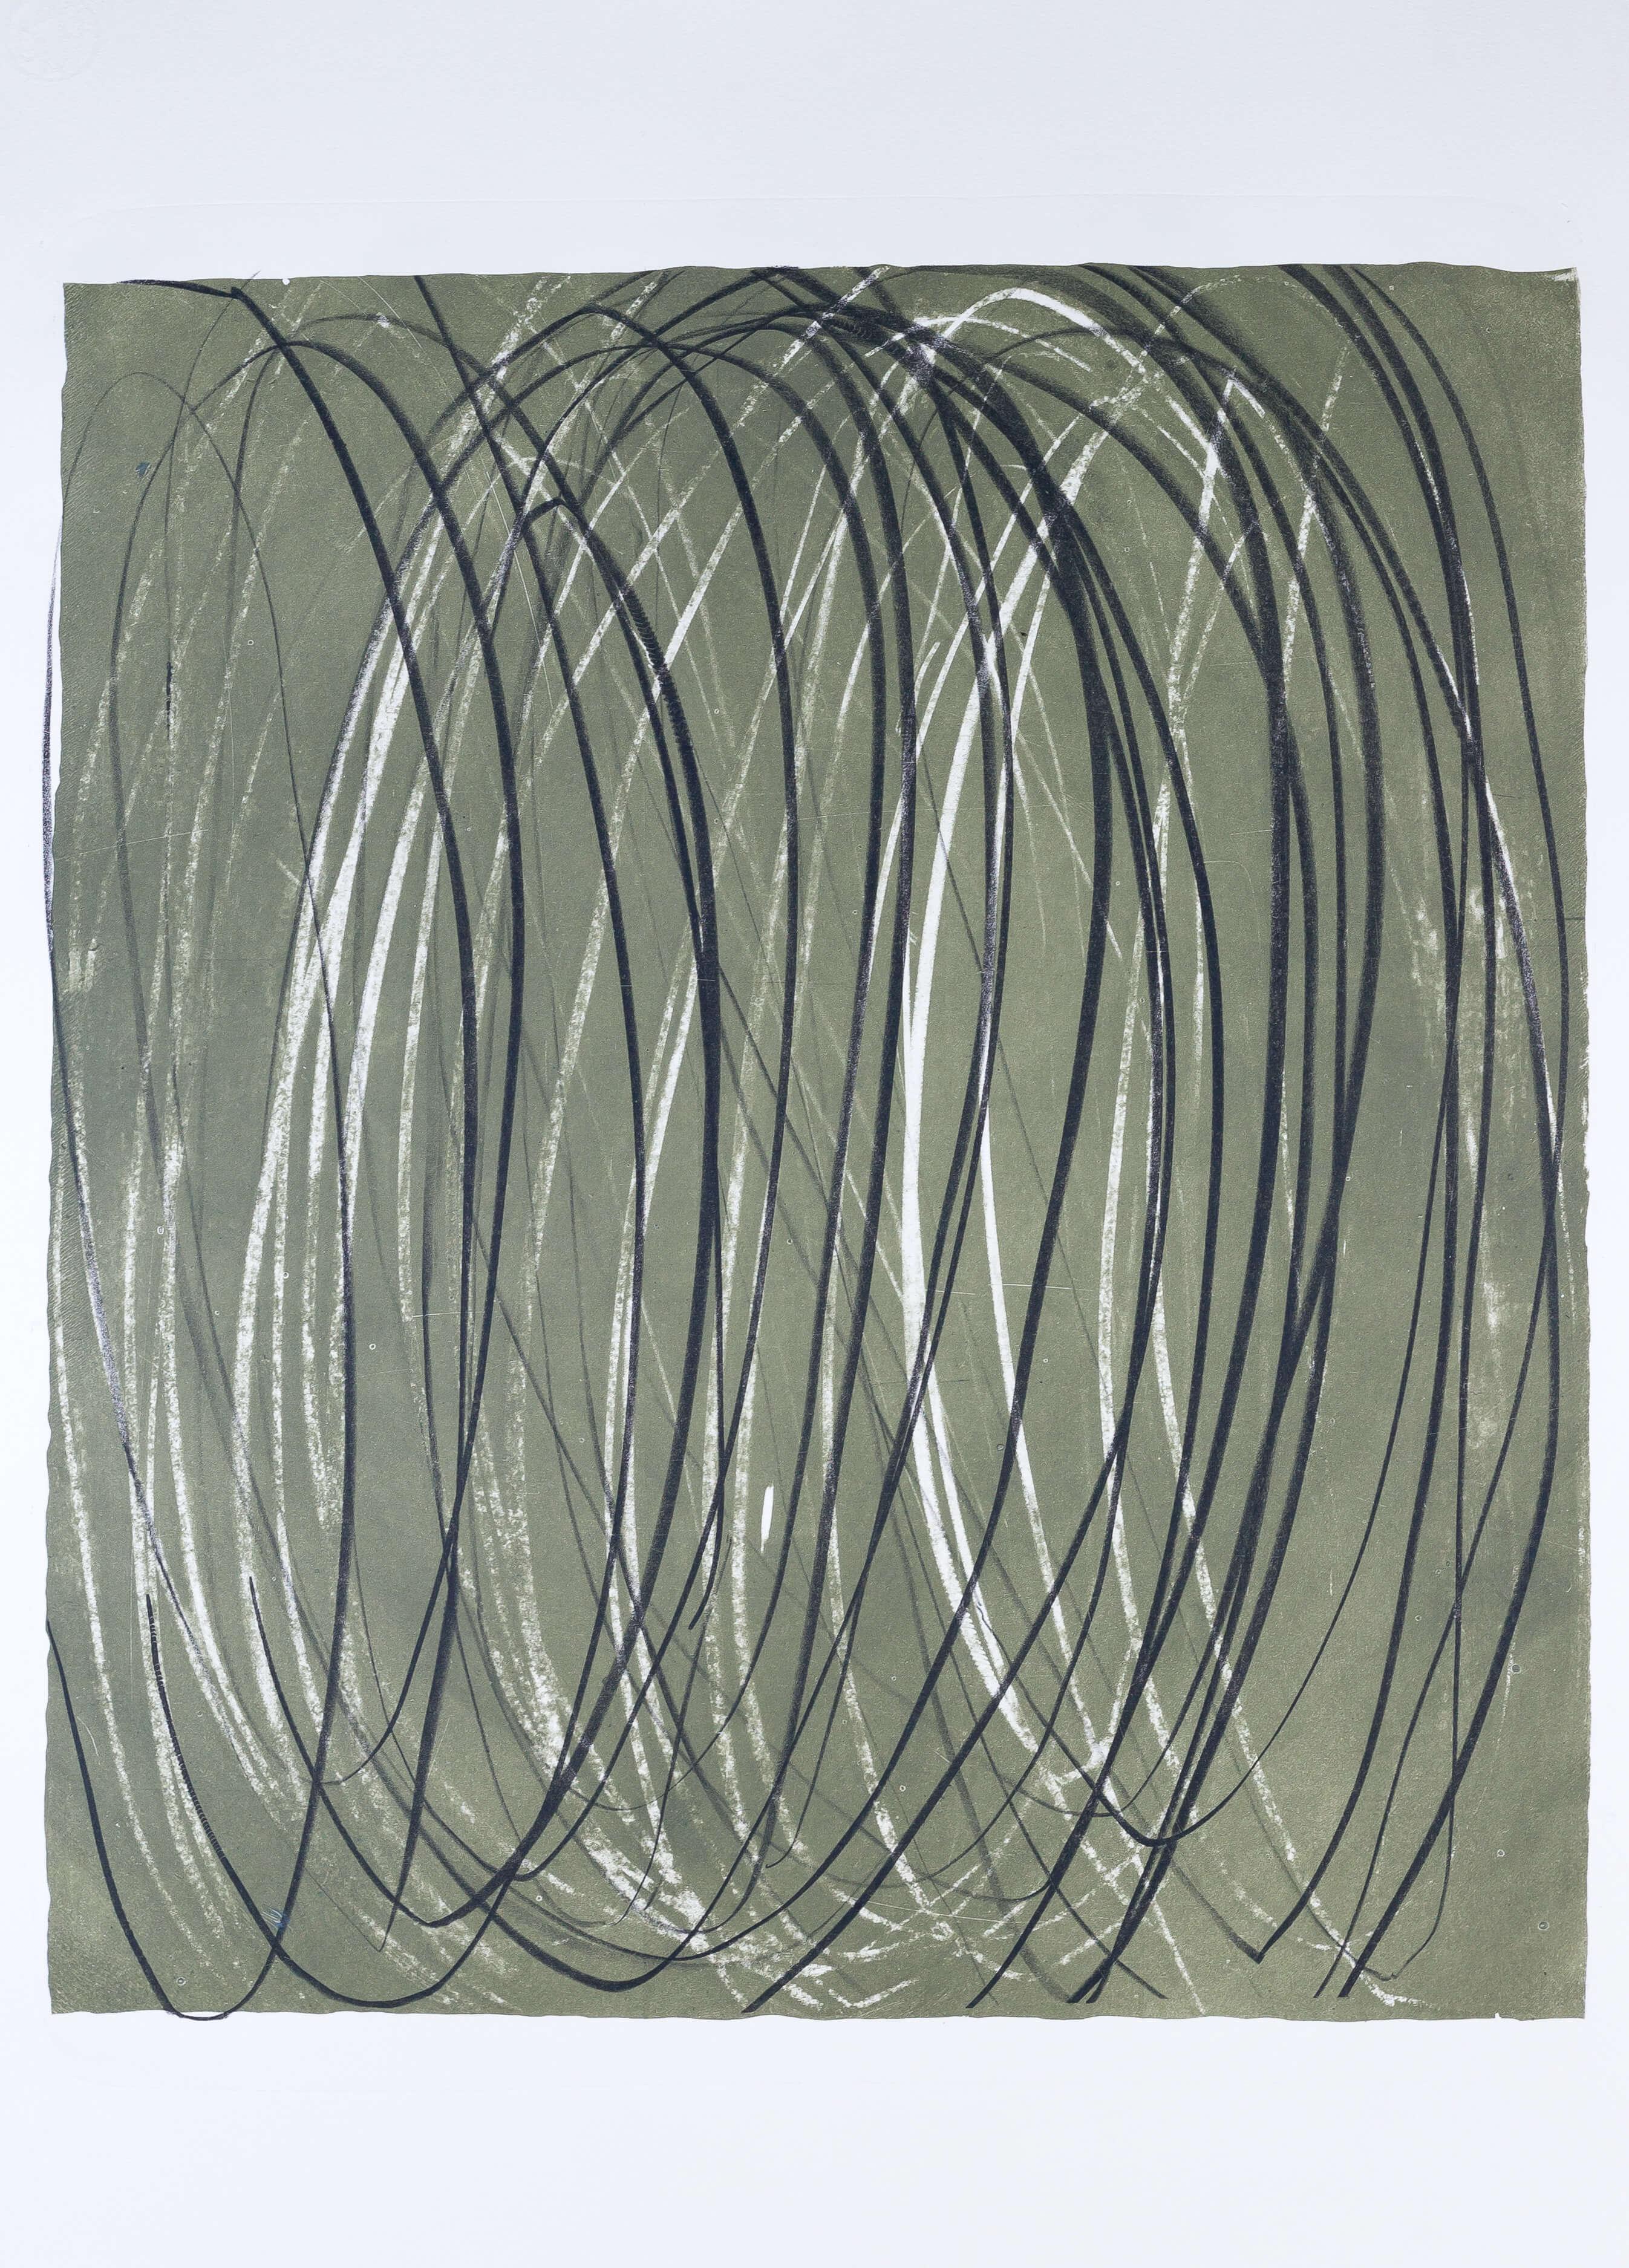 Katharina Albers, Transformation XIII.I, 2011, Farblithographie, Unikat, 59,5x48,5cm